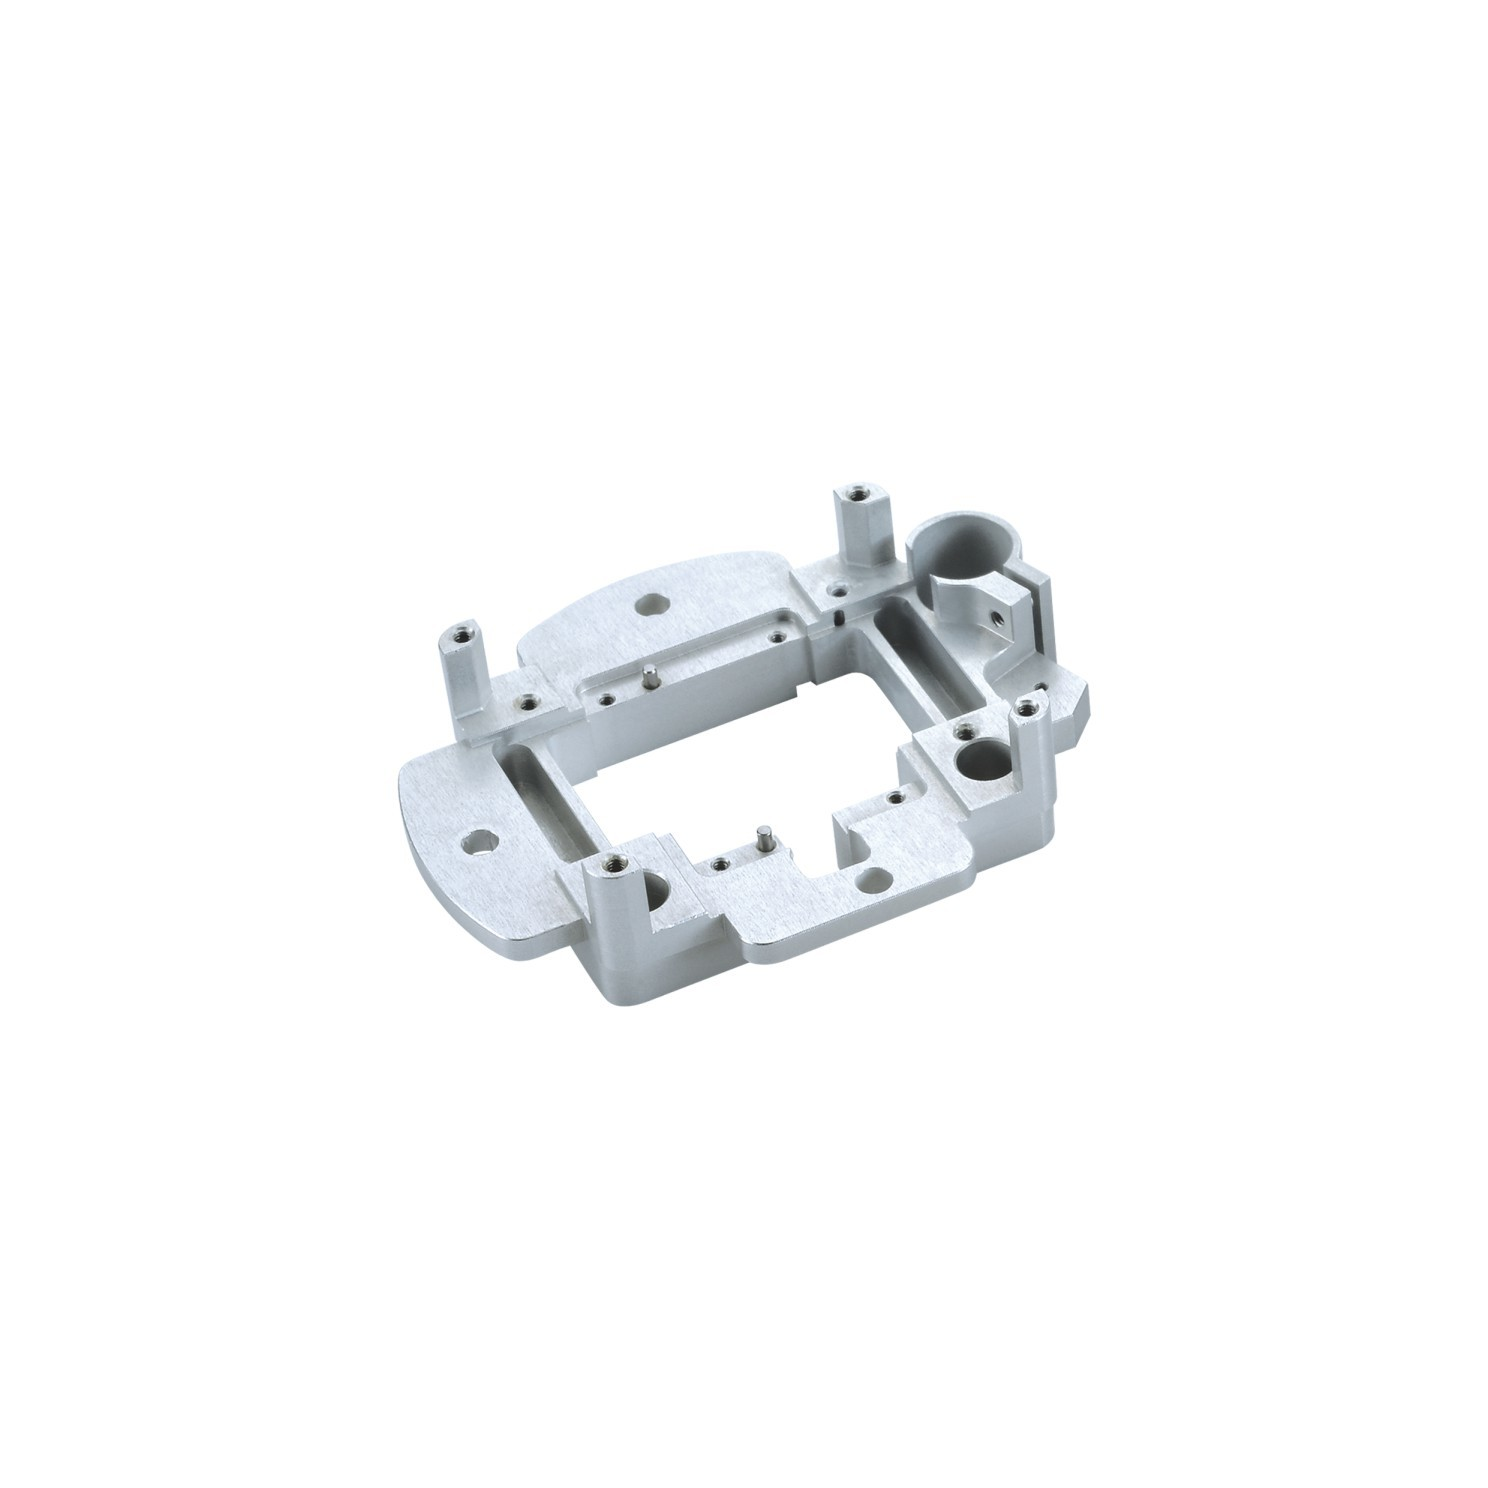 CNC machined part custom aluminum cnc machining part with white anodizing